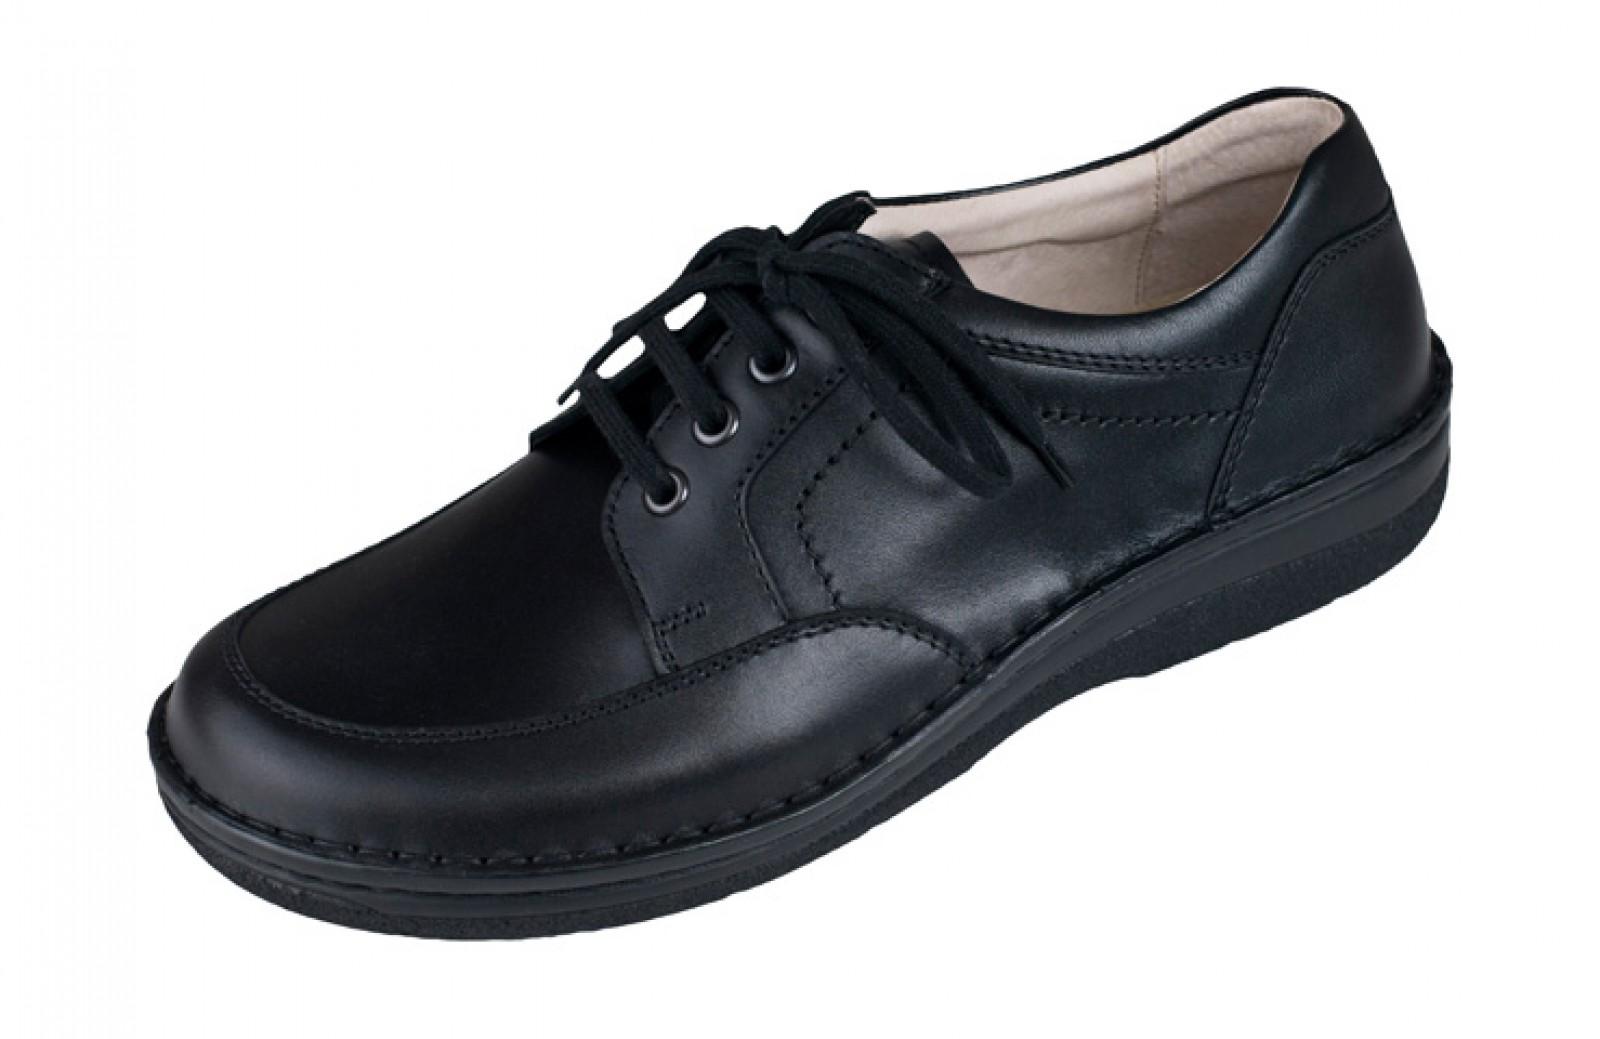 Berkemann Frieder férfi cipő - Berkemann papucs Gyógyászati termékek ... 8943b45aeb